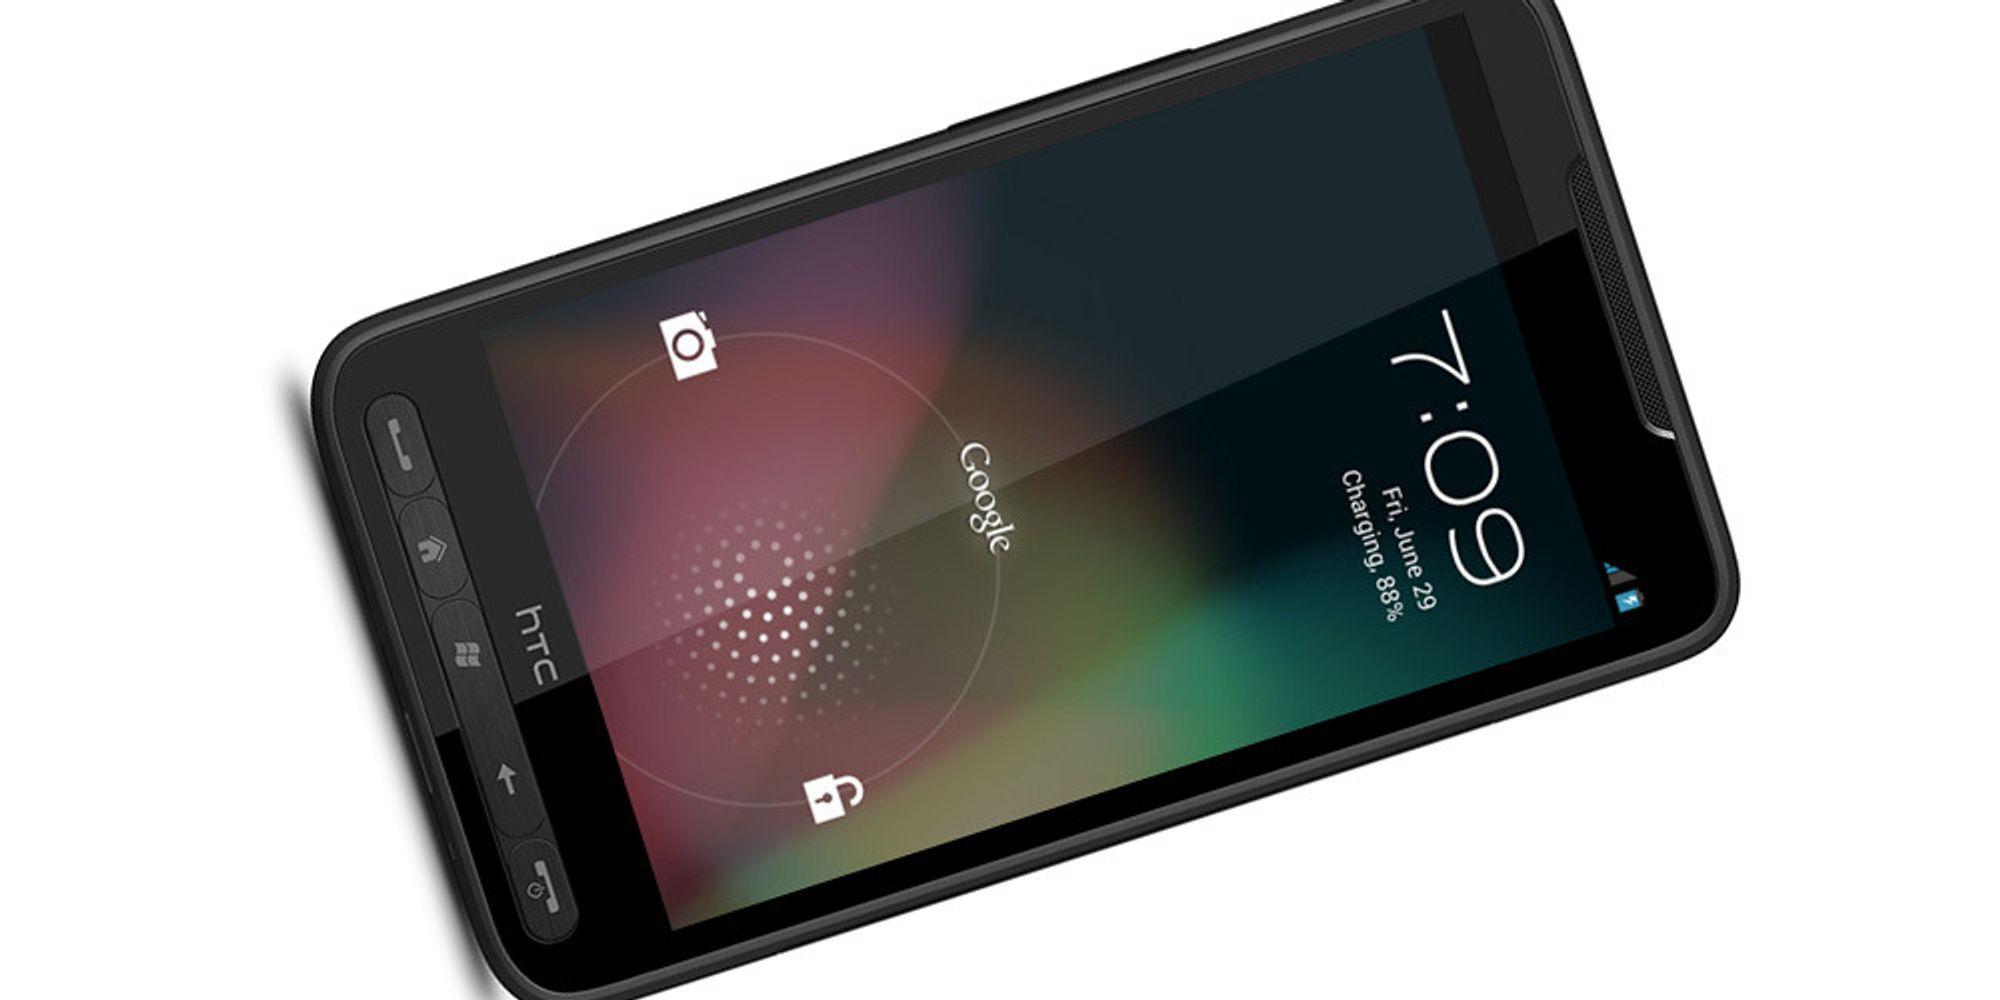 JellyBean er portert til HTC HD2